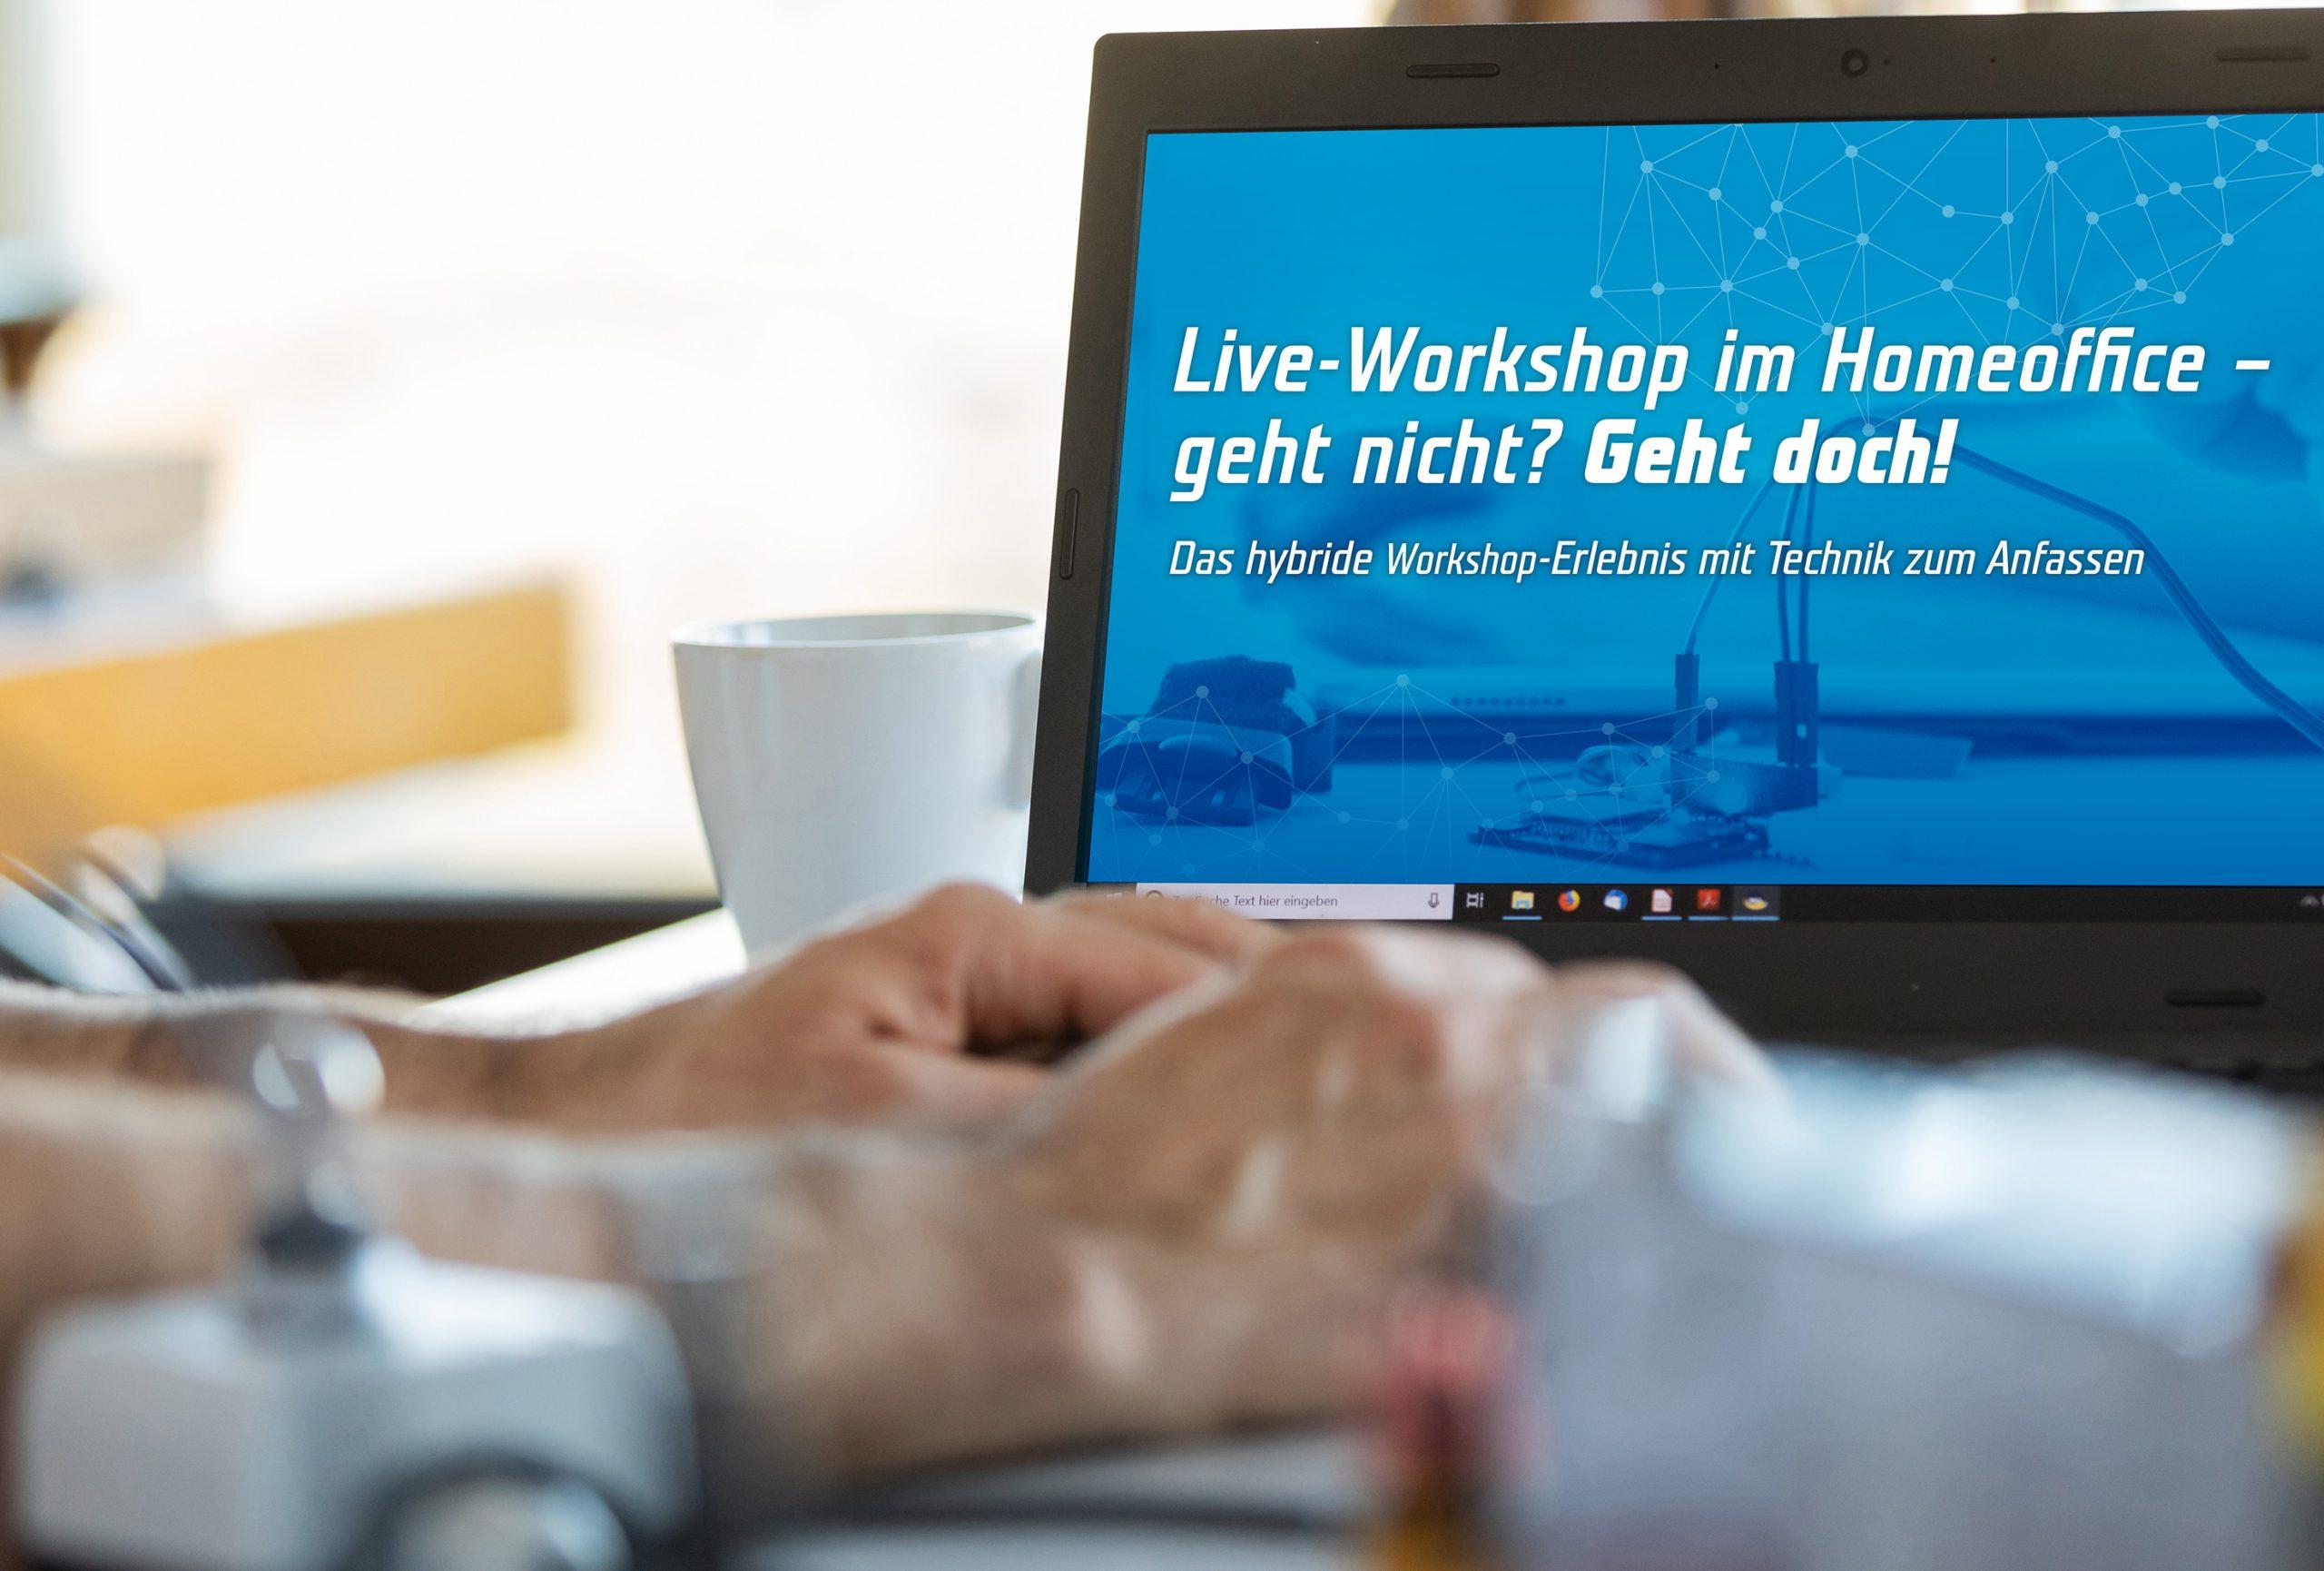 Live-Workshop im Homeoffice